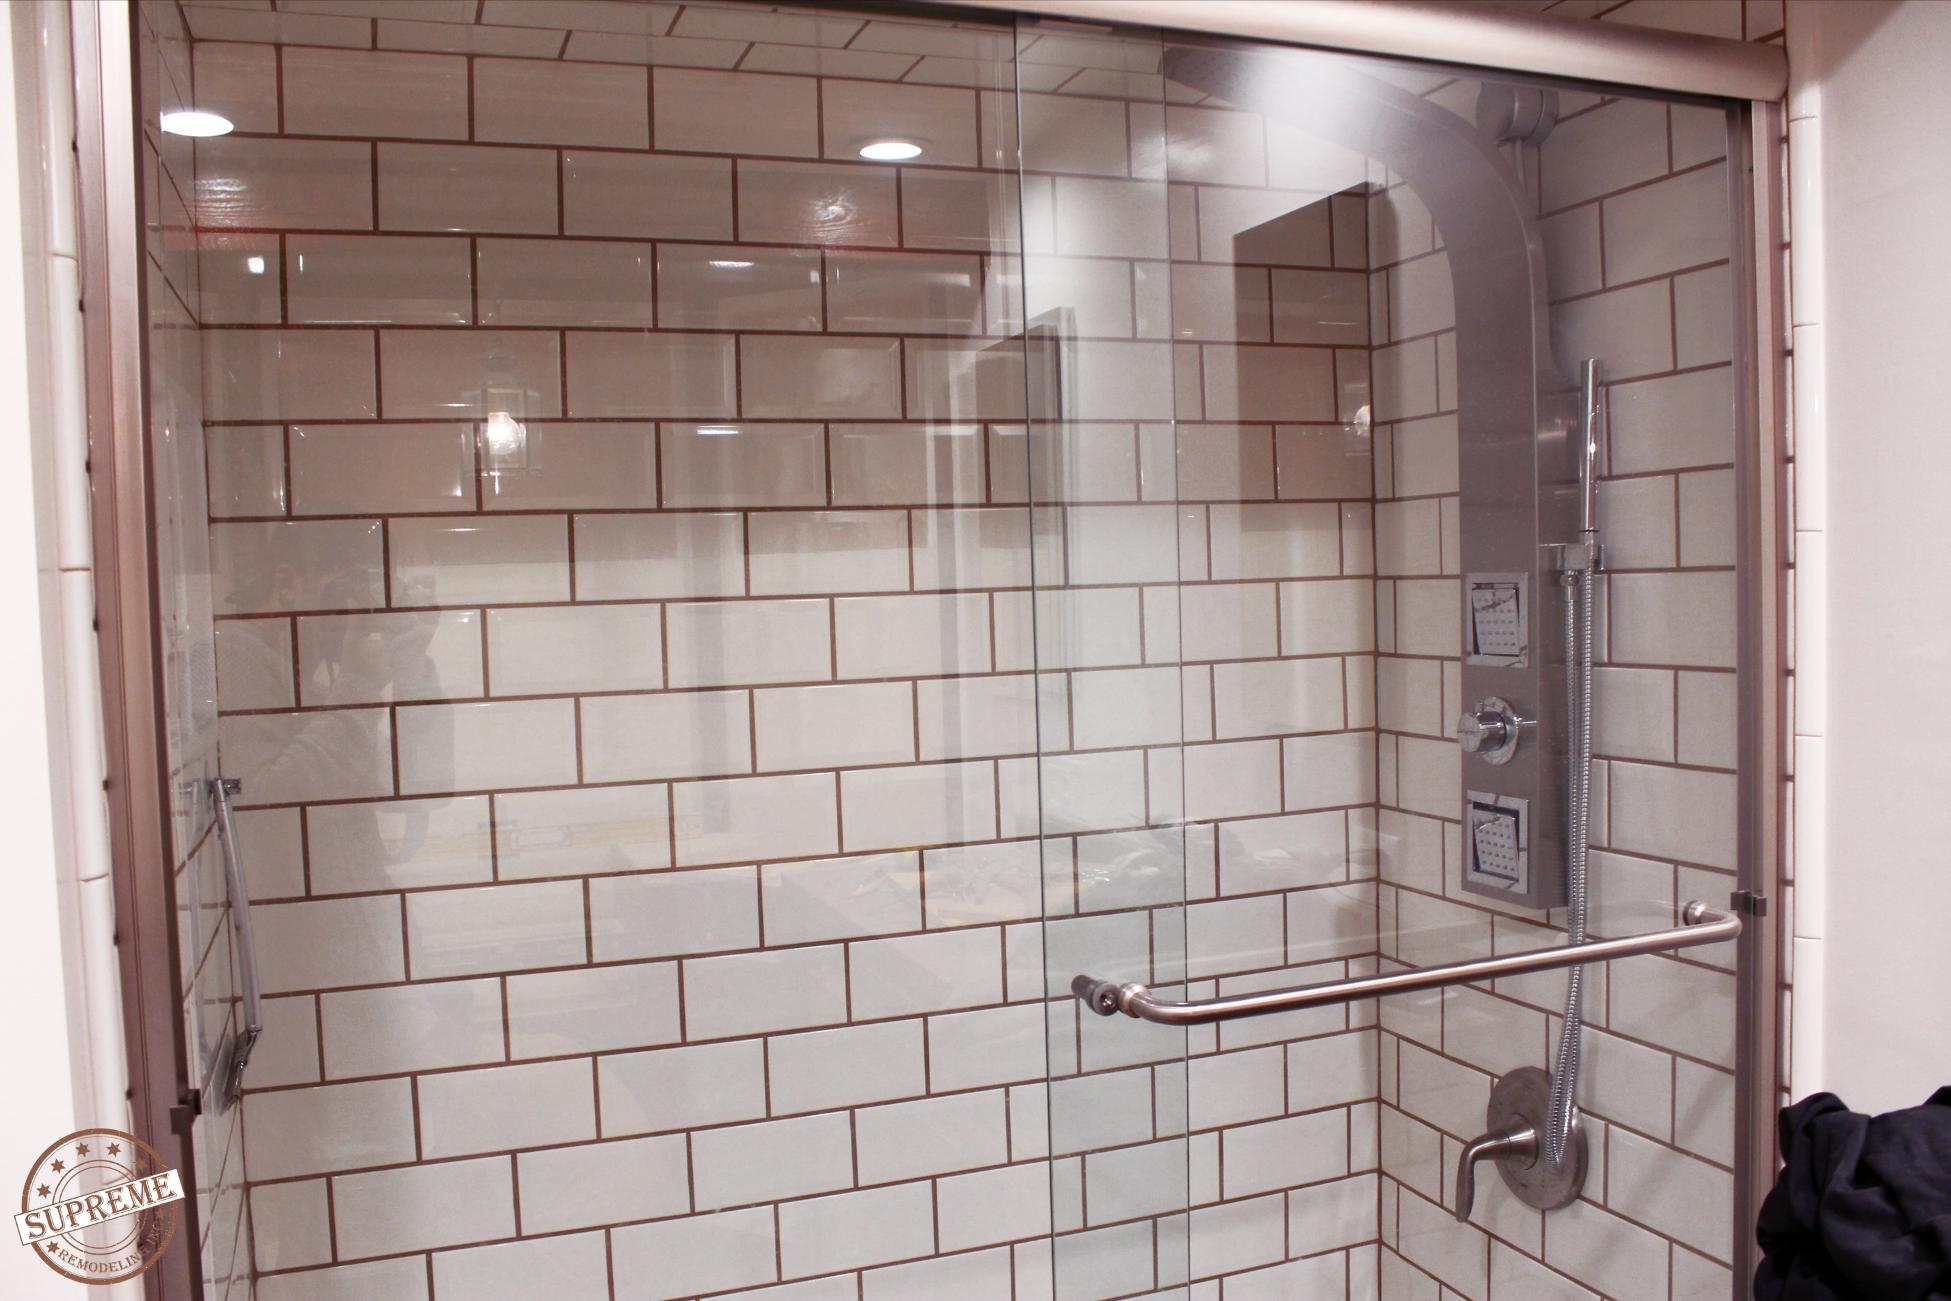 Landscaping Bathroom Remodeling By Supreme Remodeling Santa Monica - Bathroom remodel santa monica